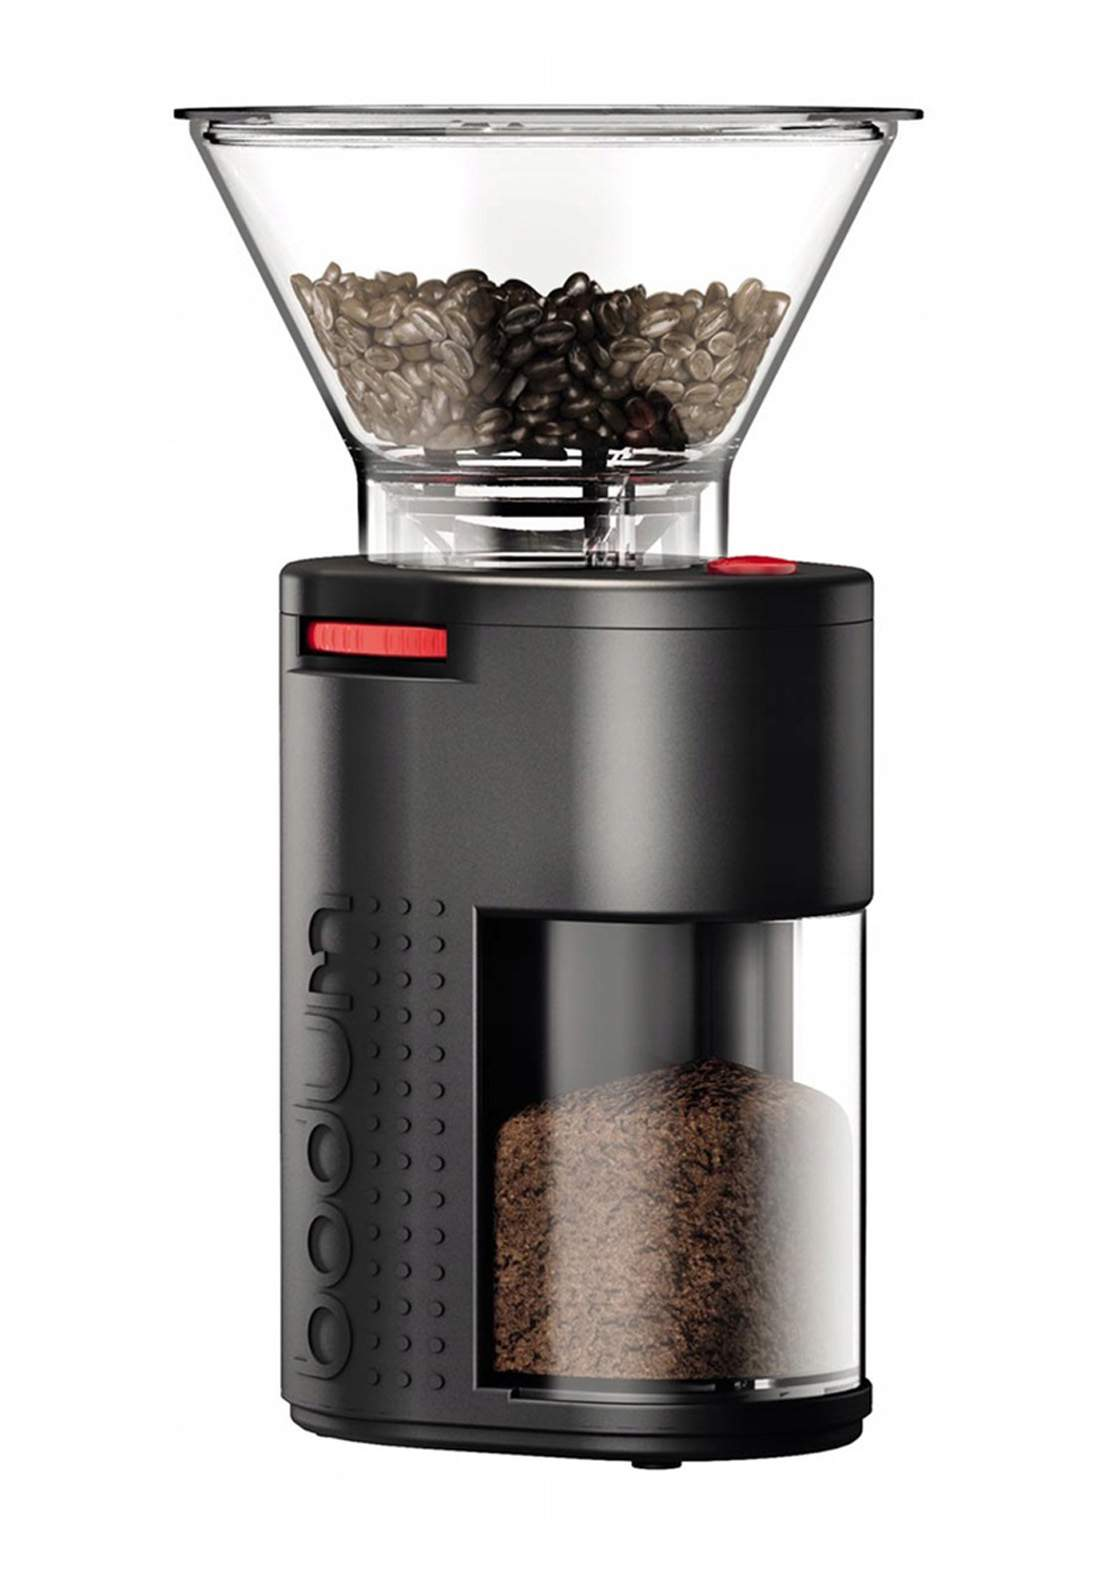 Bistro Electric Coffee Grinder طاحونة قهوة